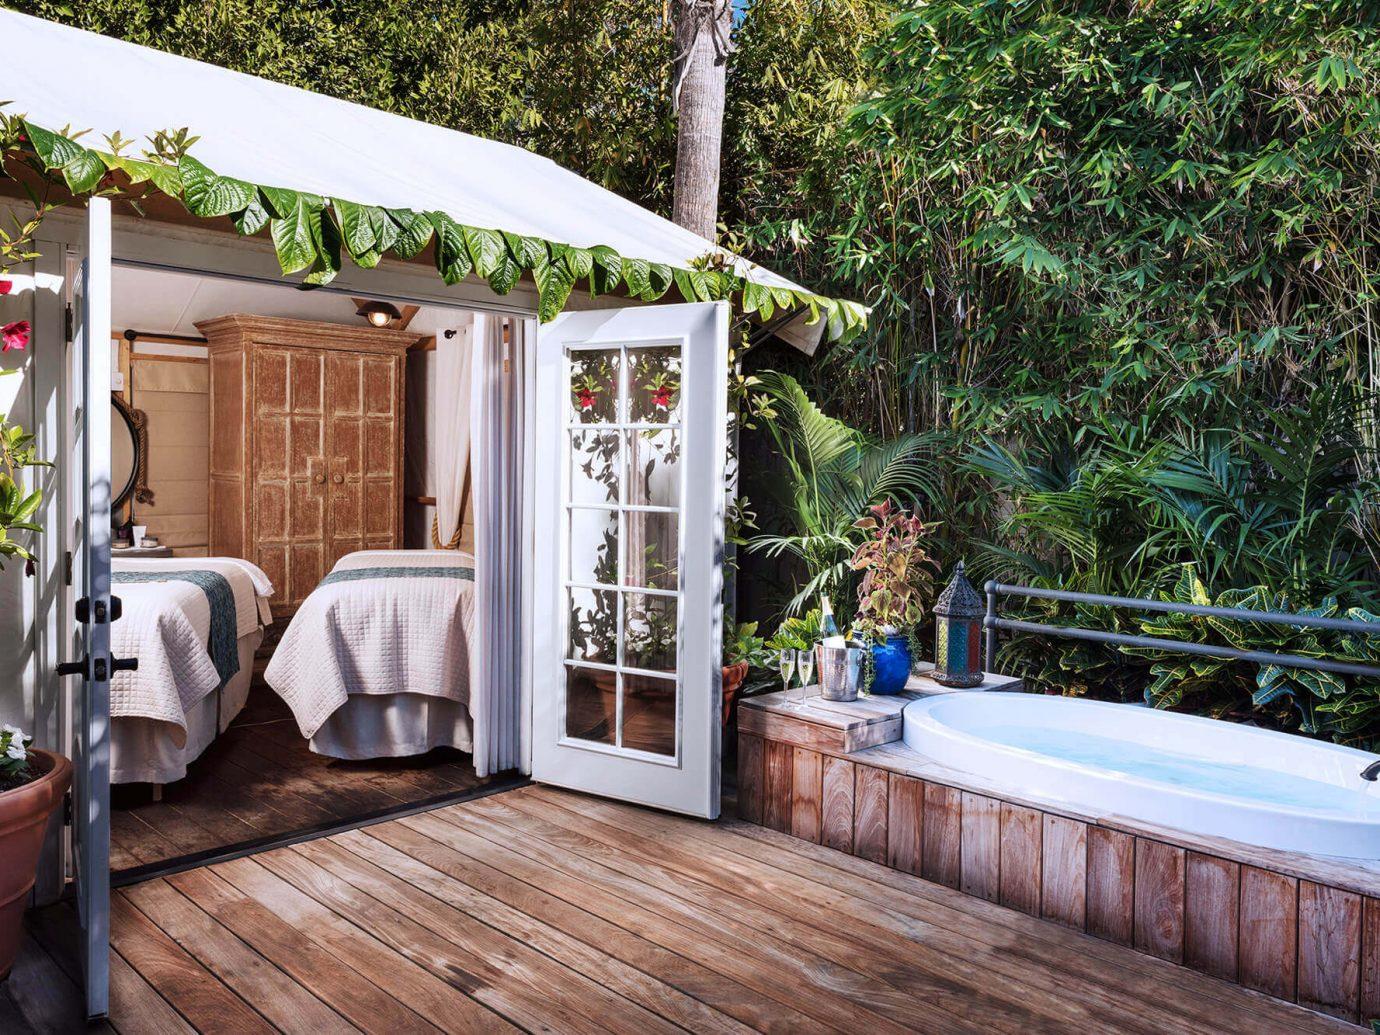 Estancia La Jolla Hotel & Spa spa